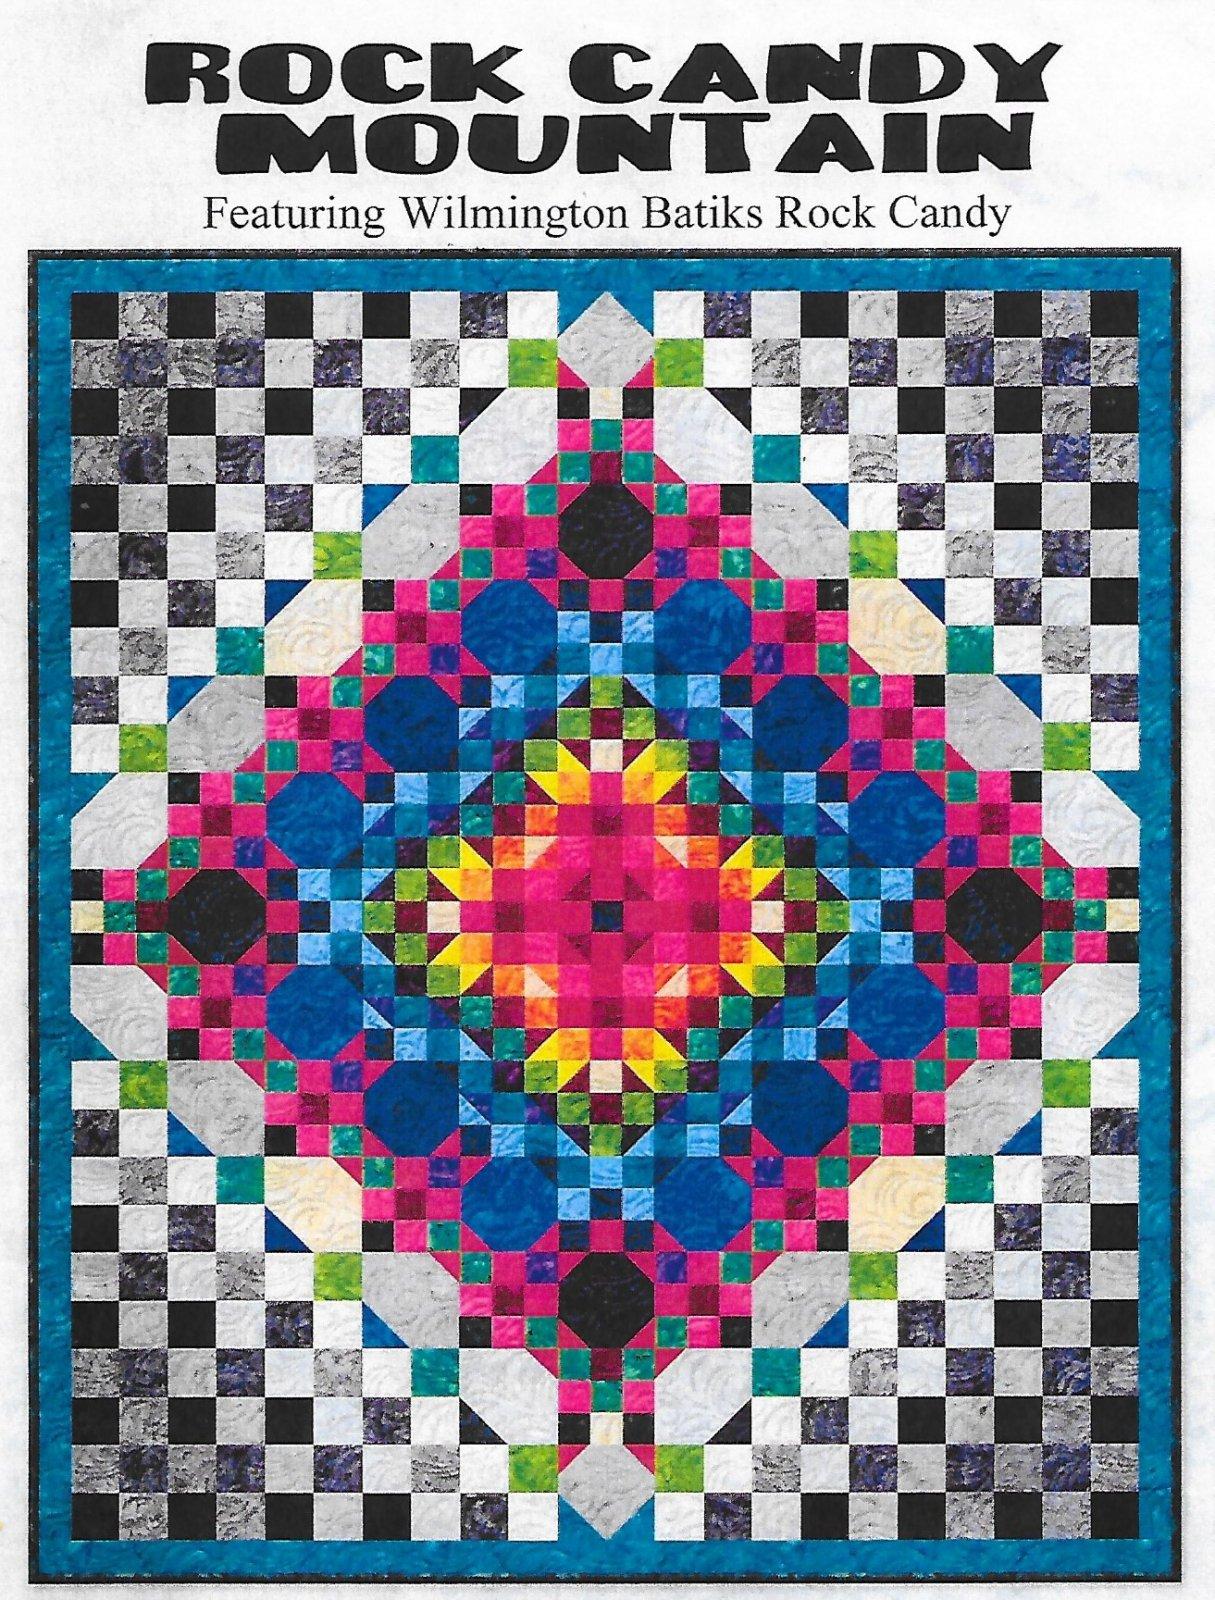 Rock Candy Batik Quilt kit in 2 sizes